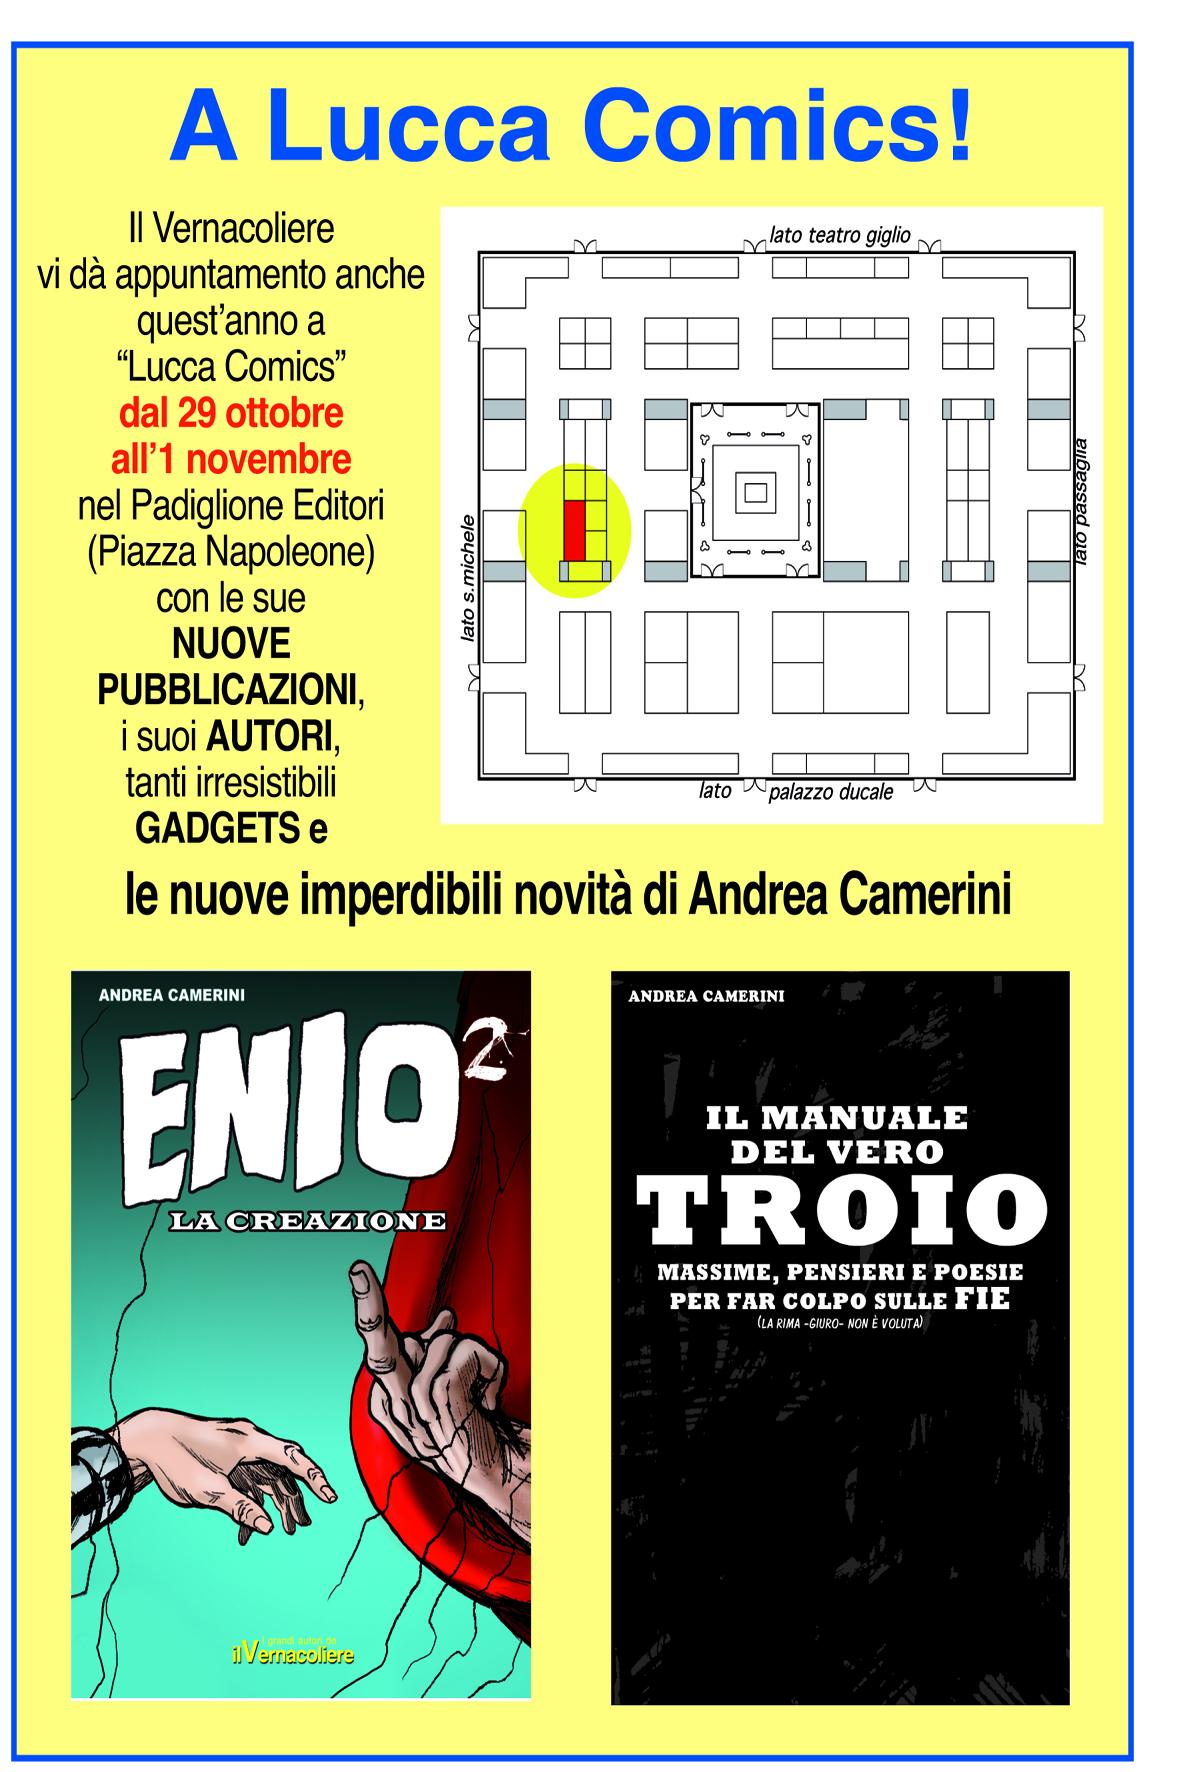 Il Vernacoliere a Lucca Comics